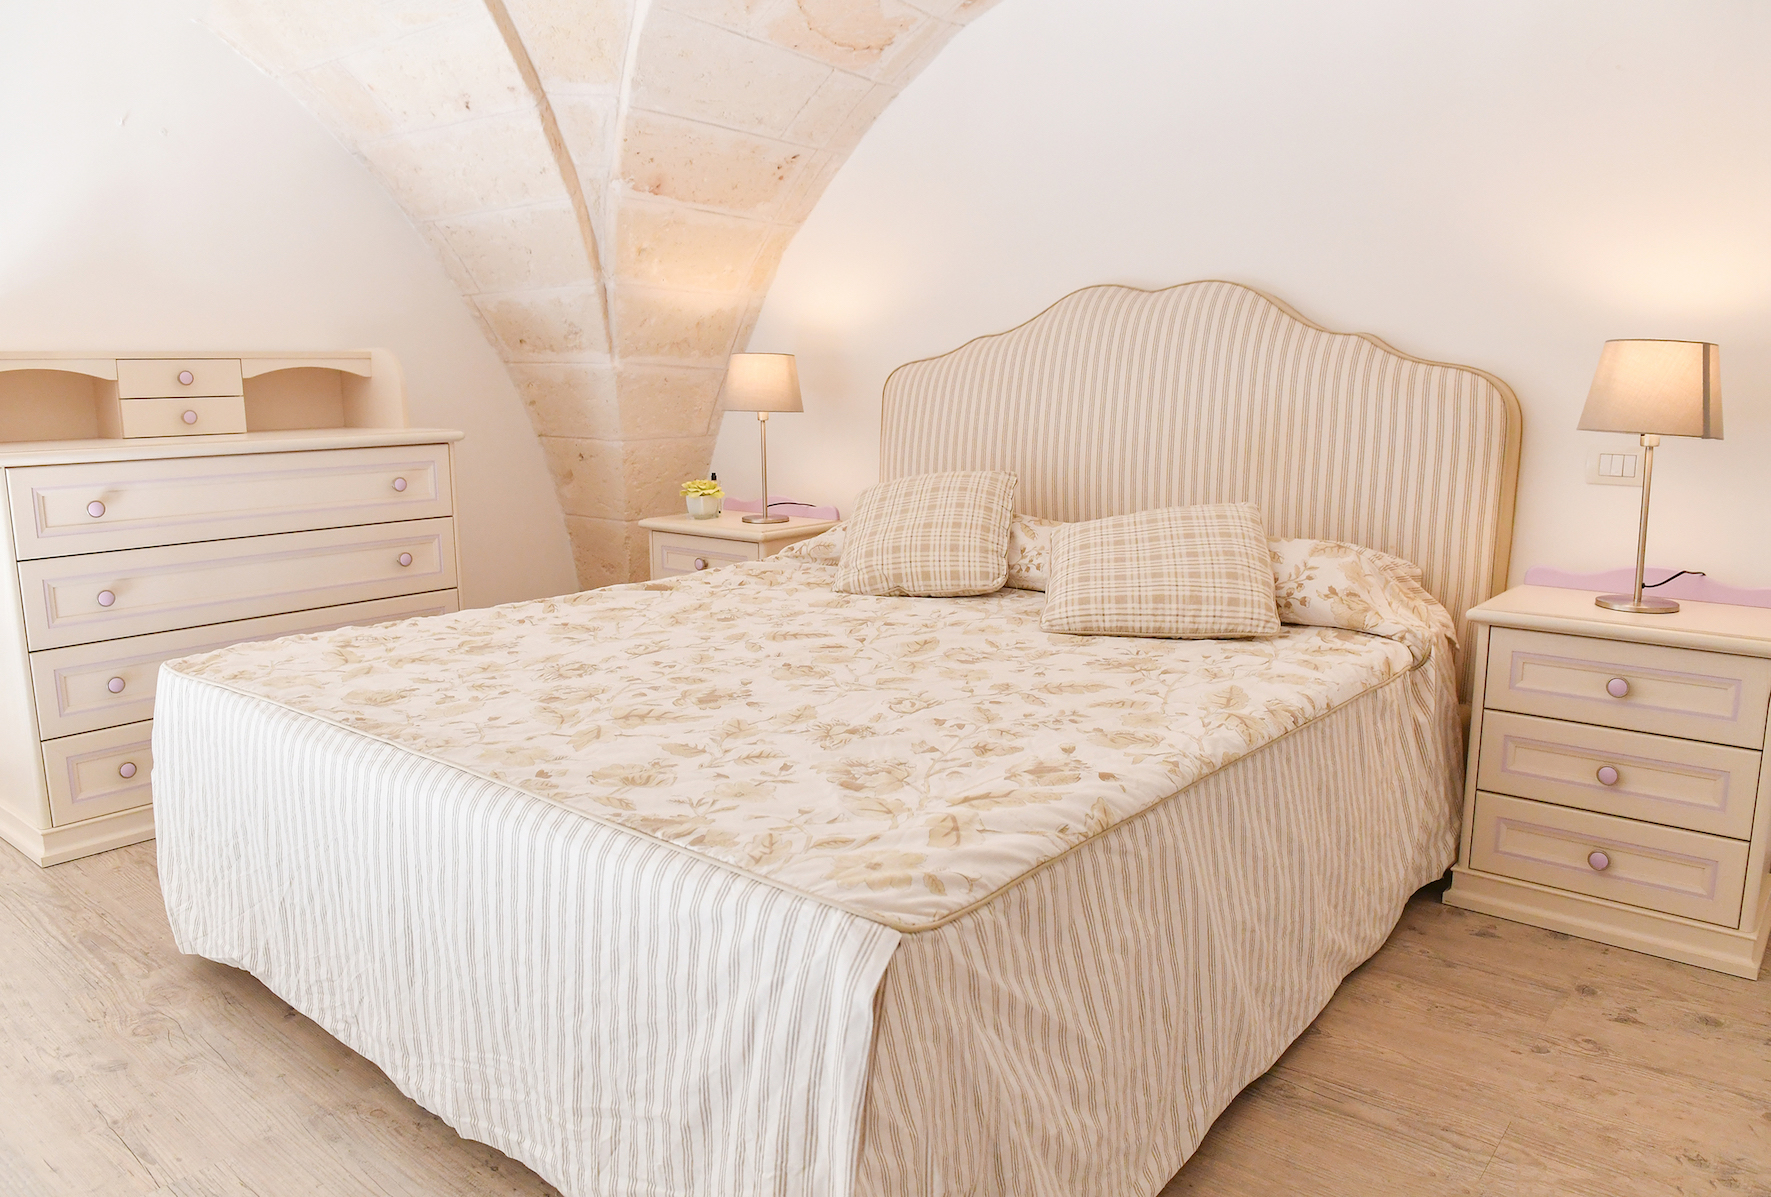 Lecce 5 - Bedroom on the mezzanine